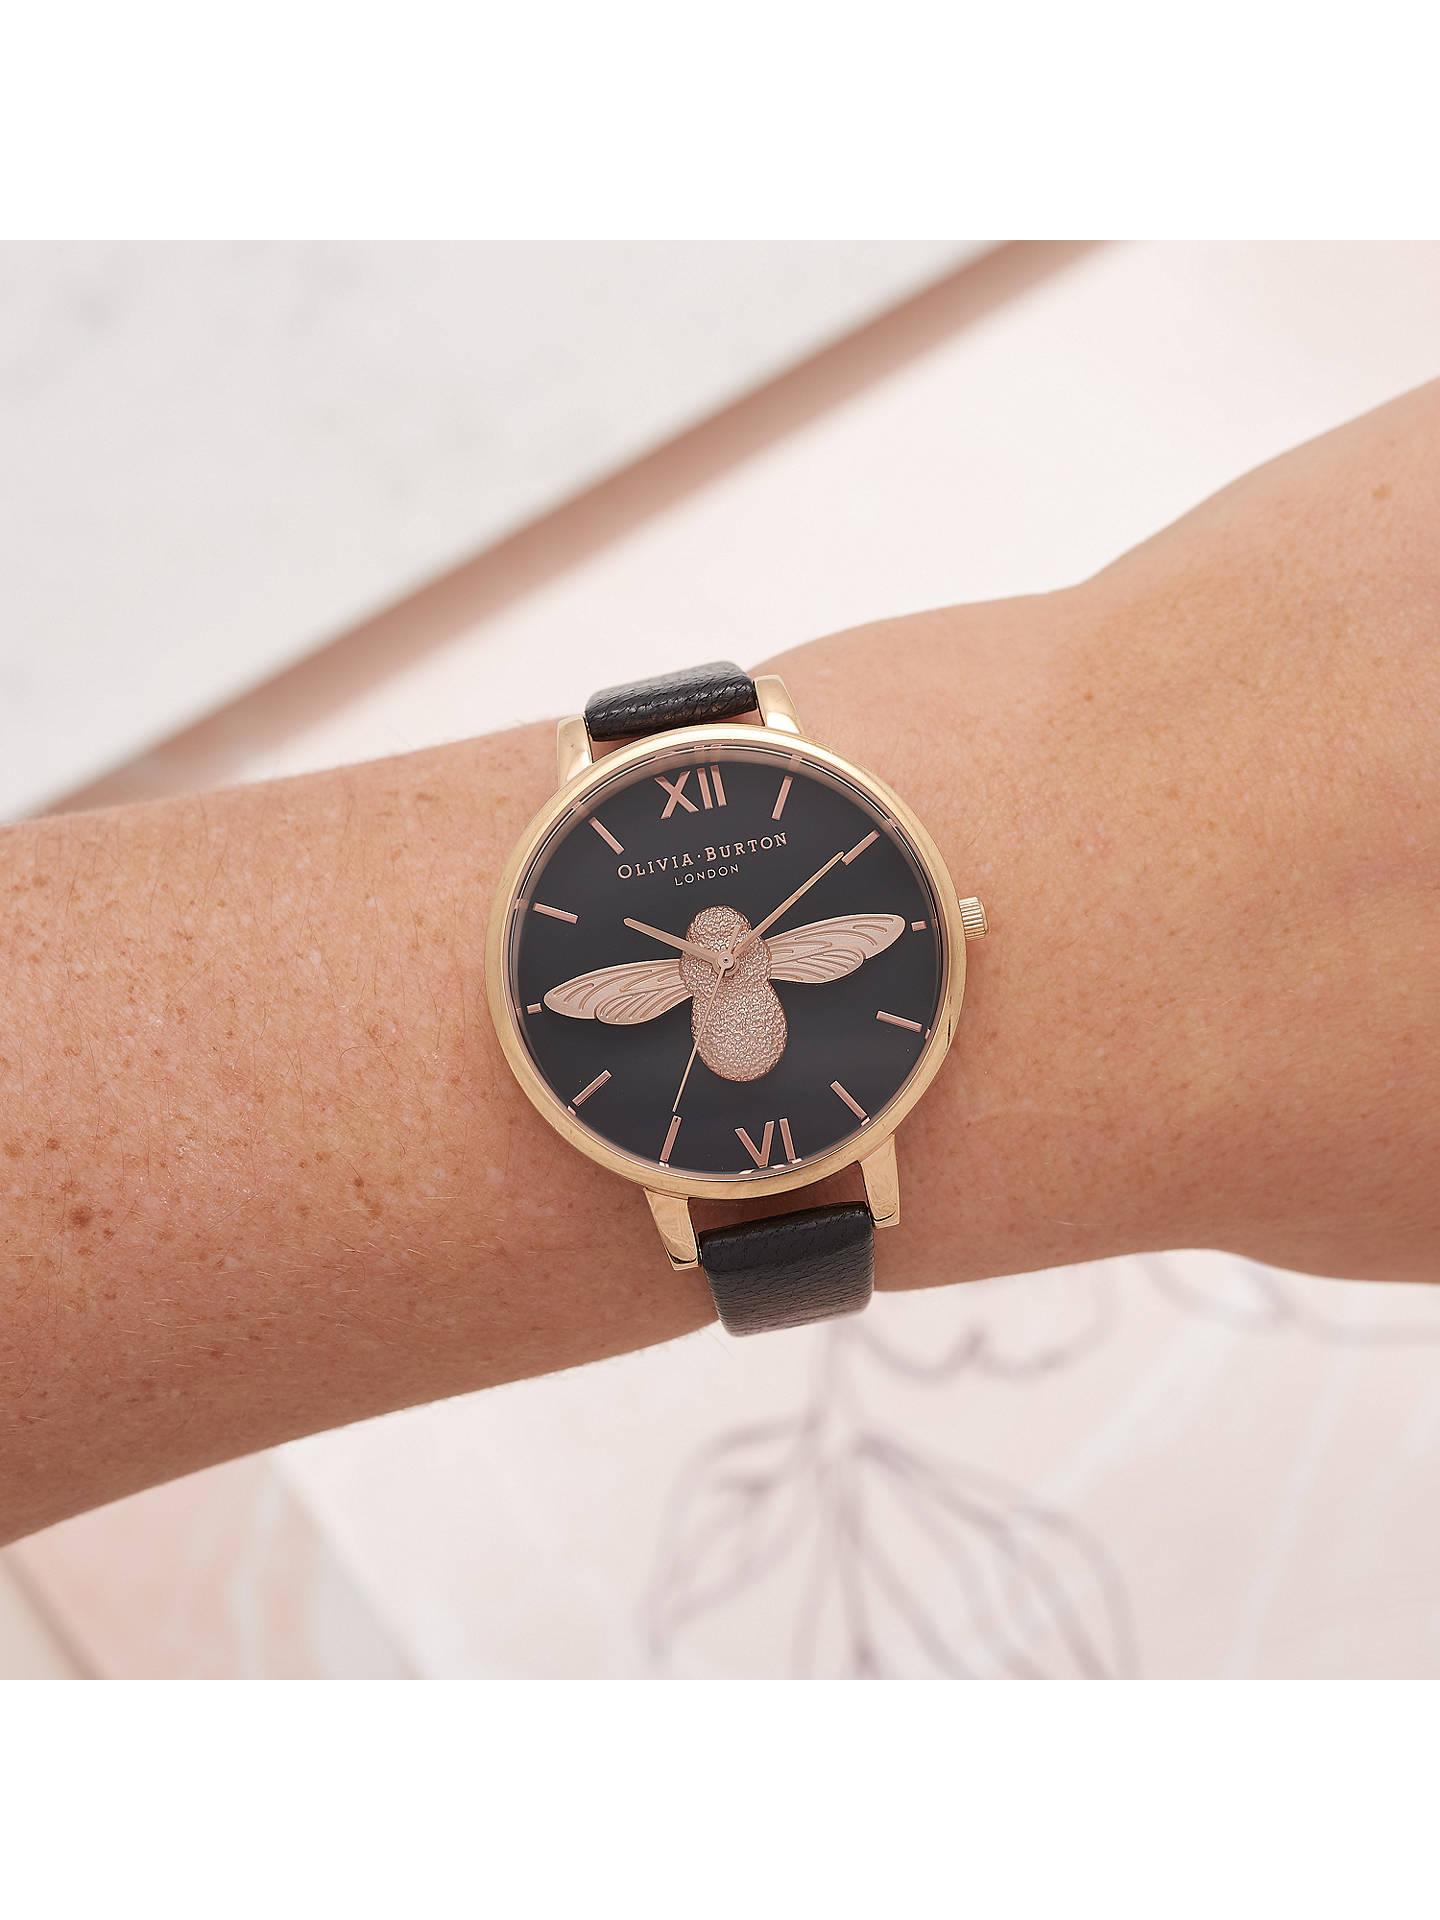 eb19e2d04 ... Buy Olivia Burton OB16AM98 Women's Animal Motifs Bee Leather Strap Watch,  Black/Rose Gold